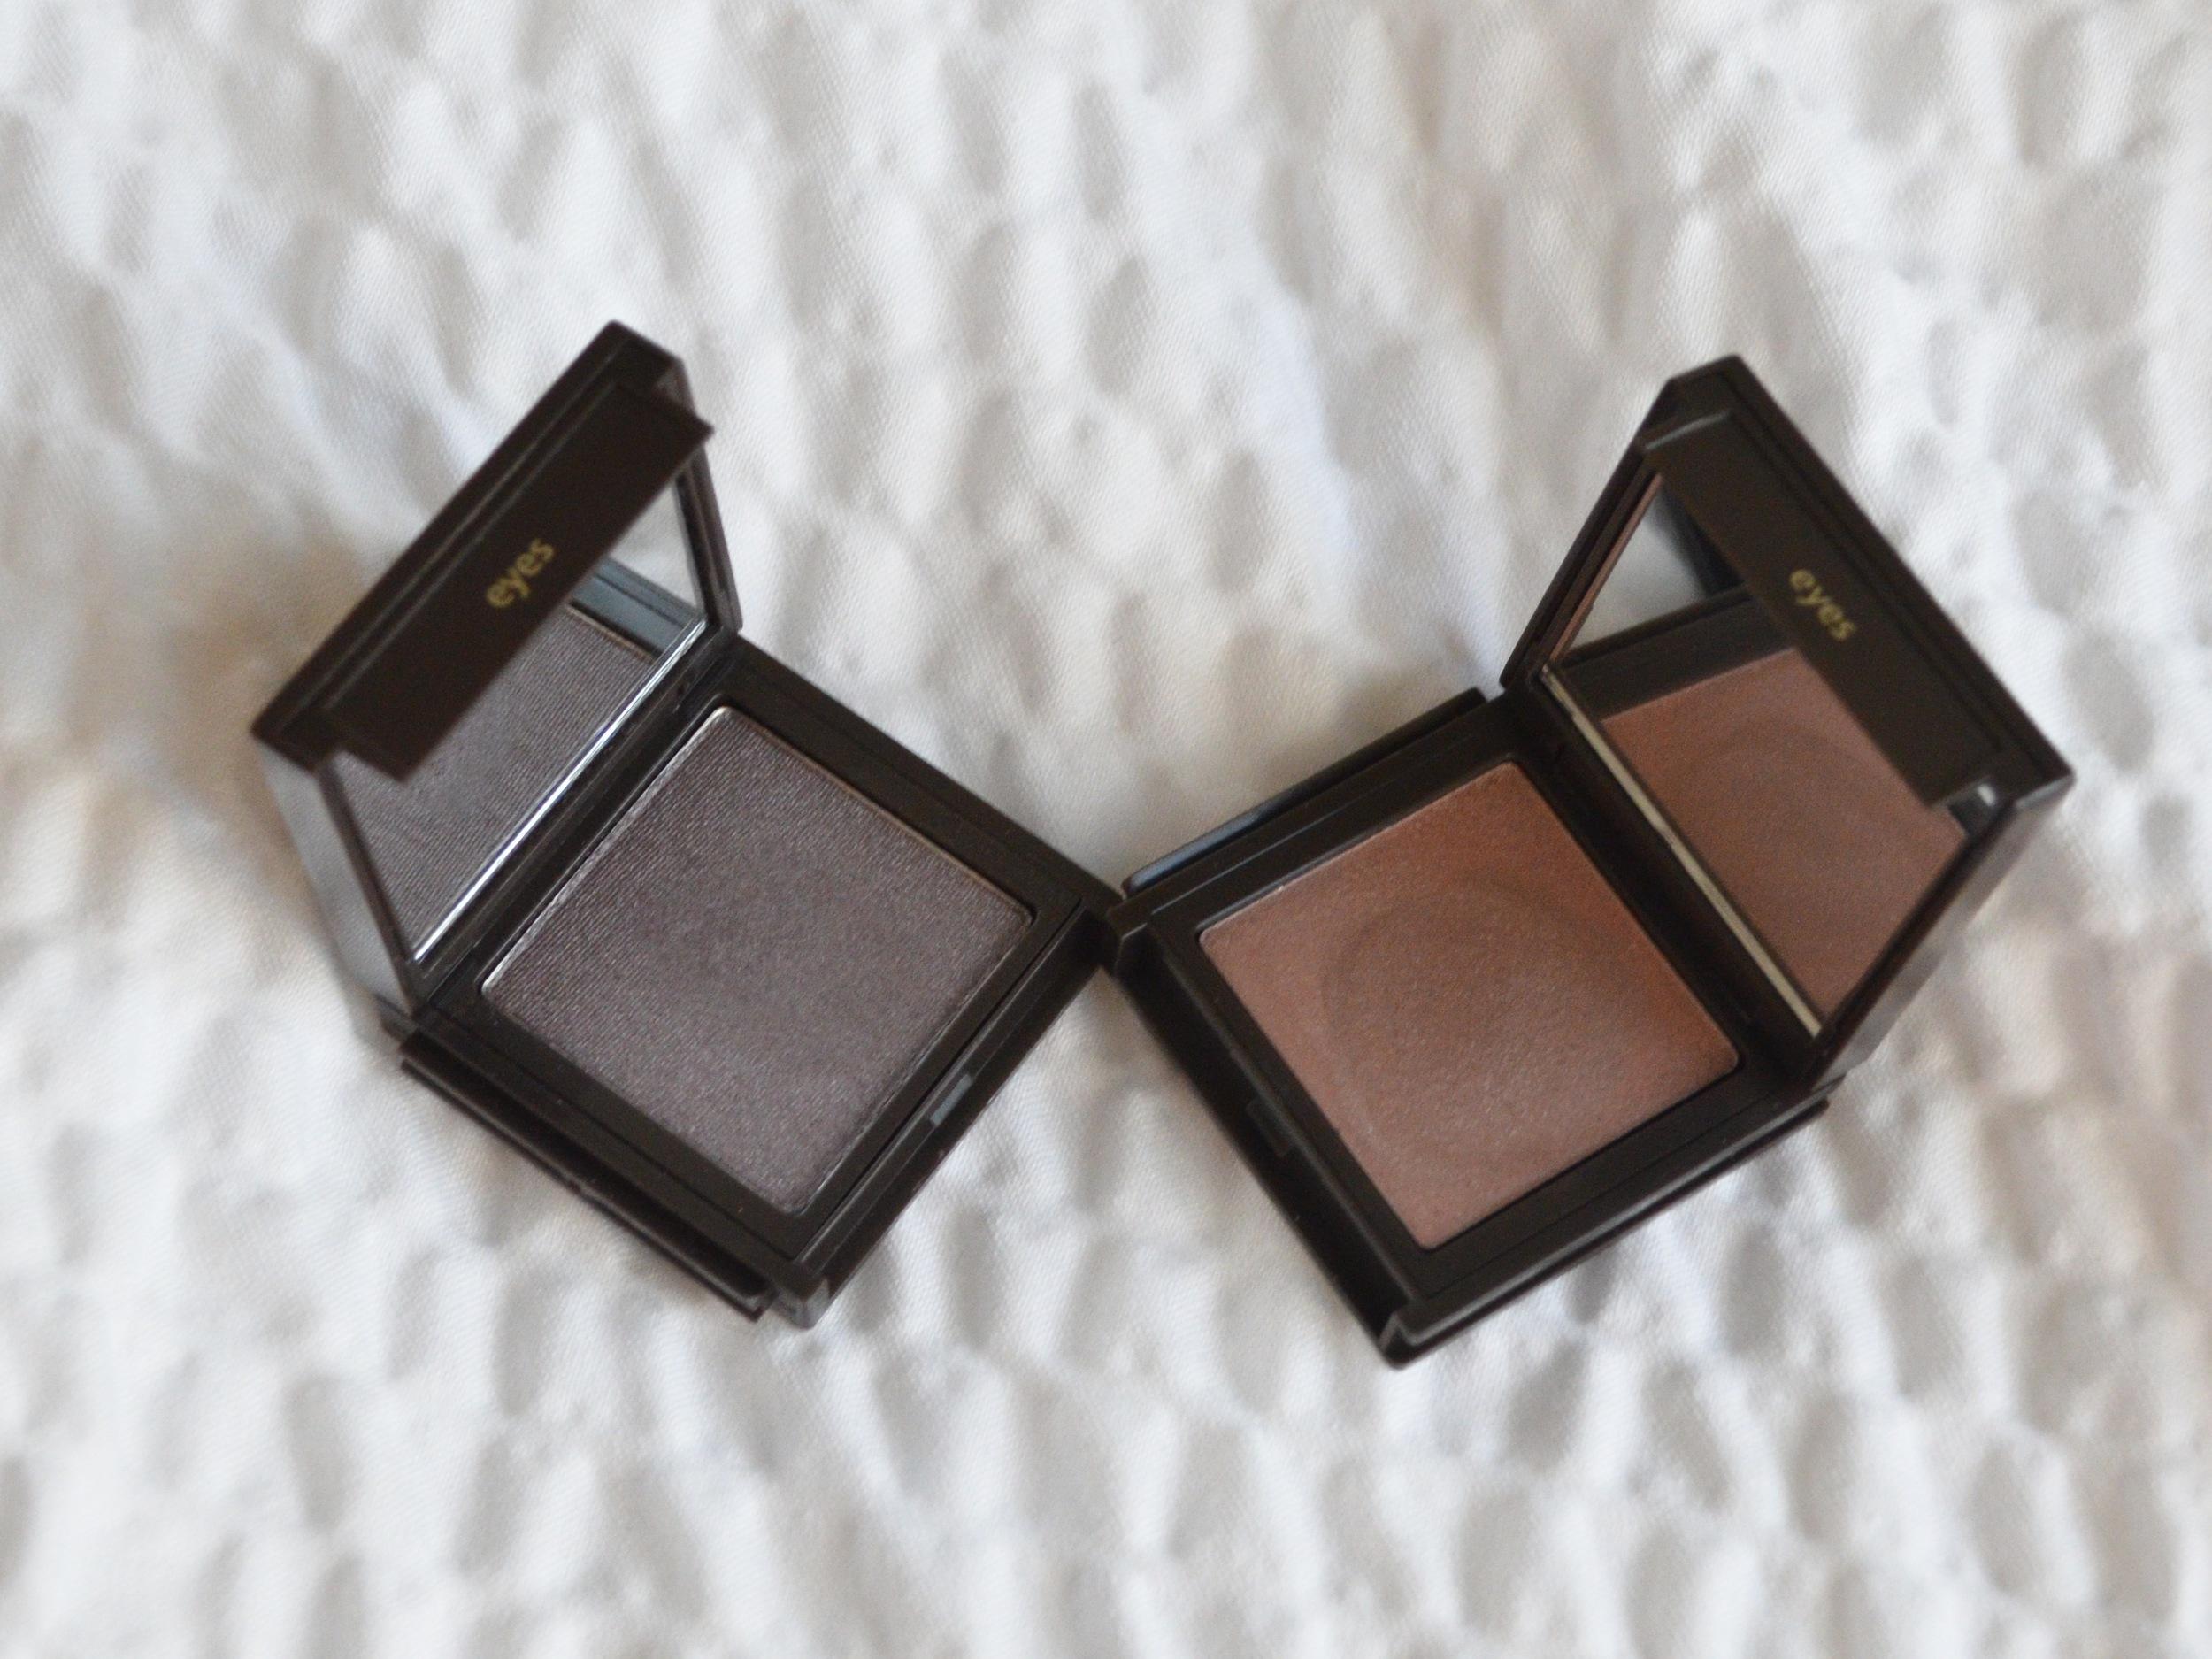 Jouer Powder Eyeshadow in Caviar review, Jouer Creme Eyeshadow in Organza review